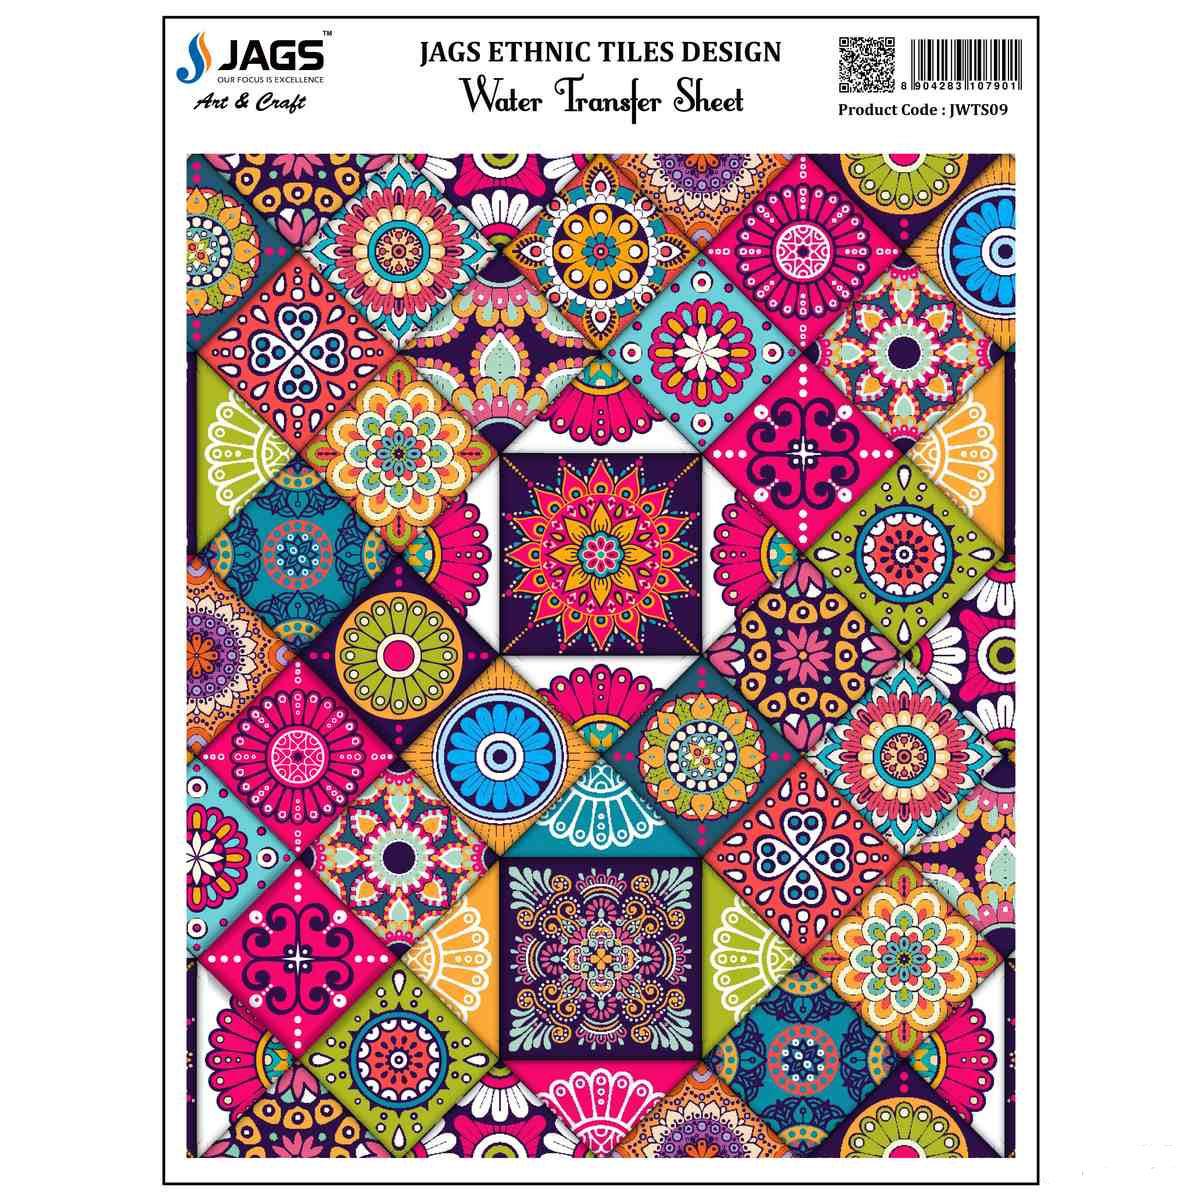 Jags Water Transfer Sheet Ethnic Tiles Desi JWTS09